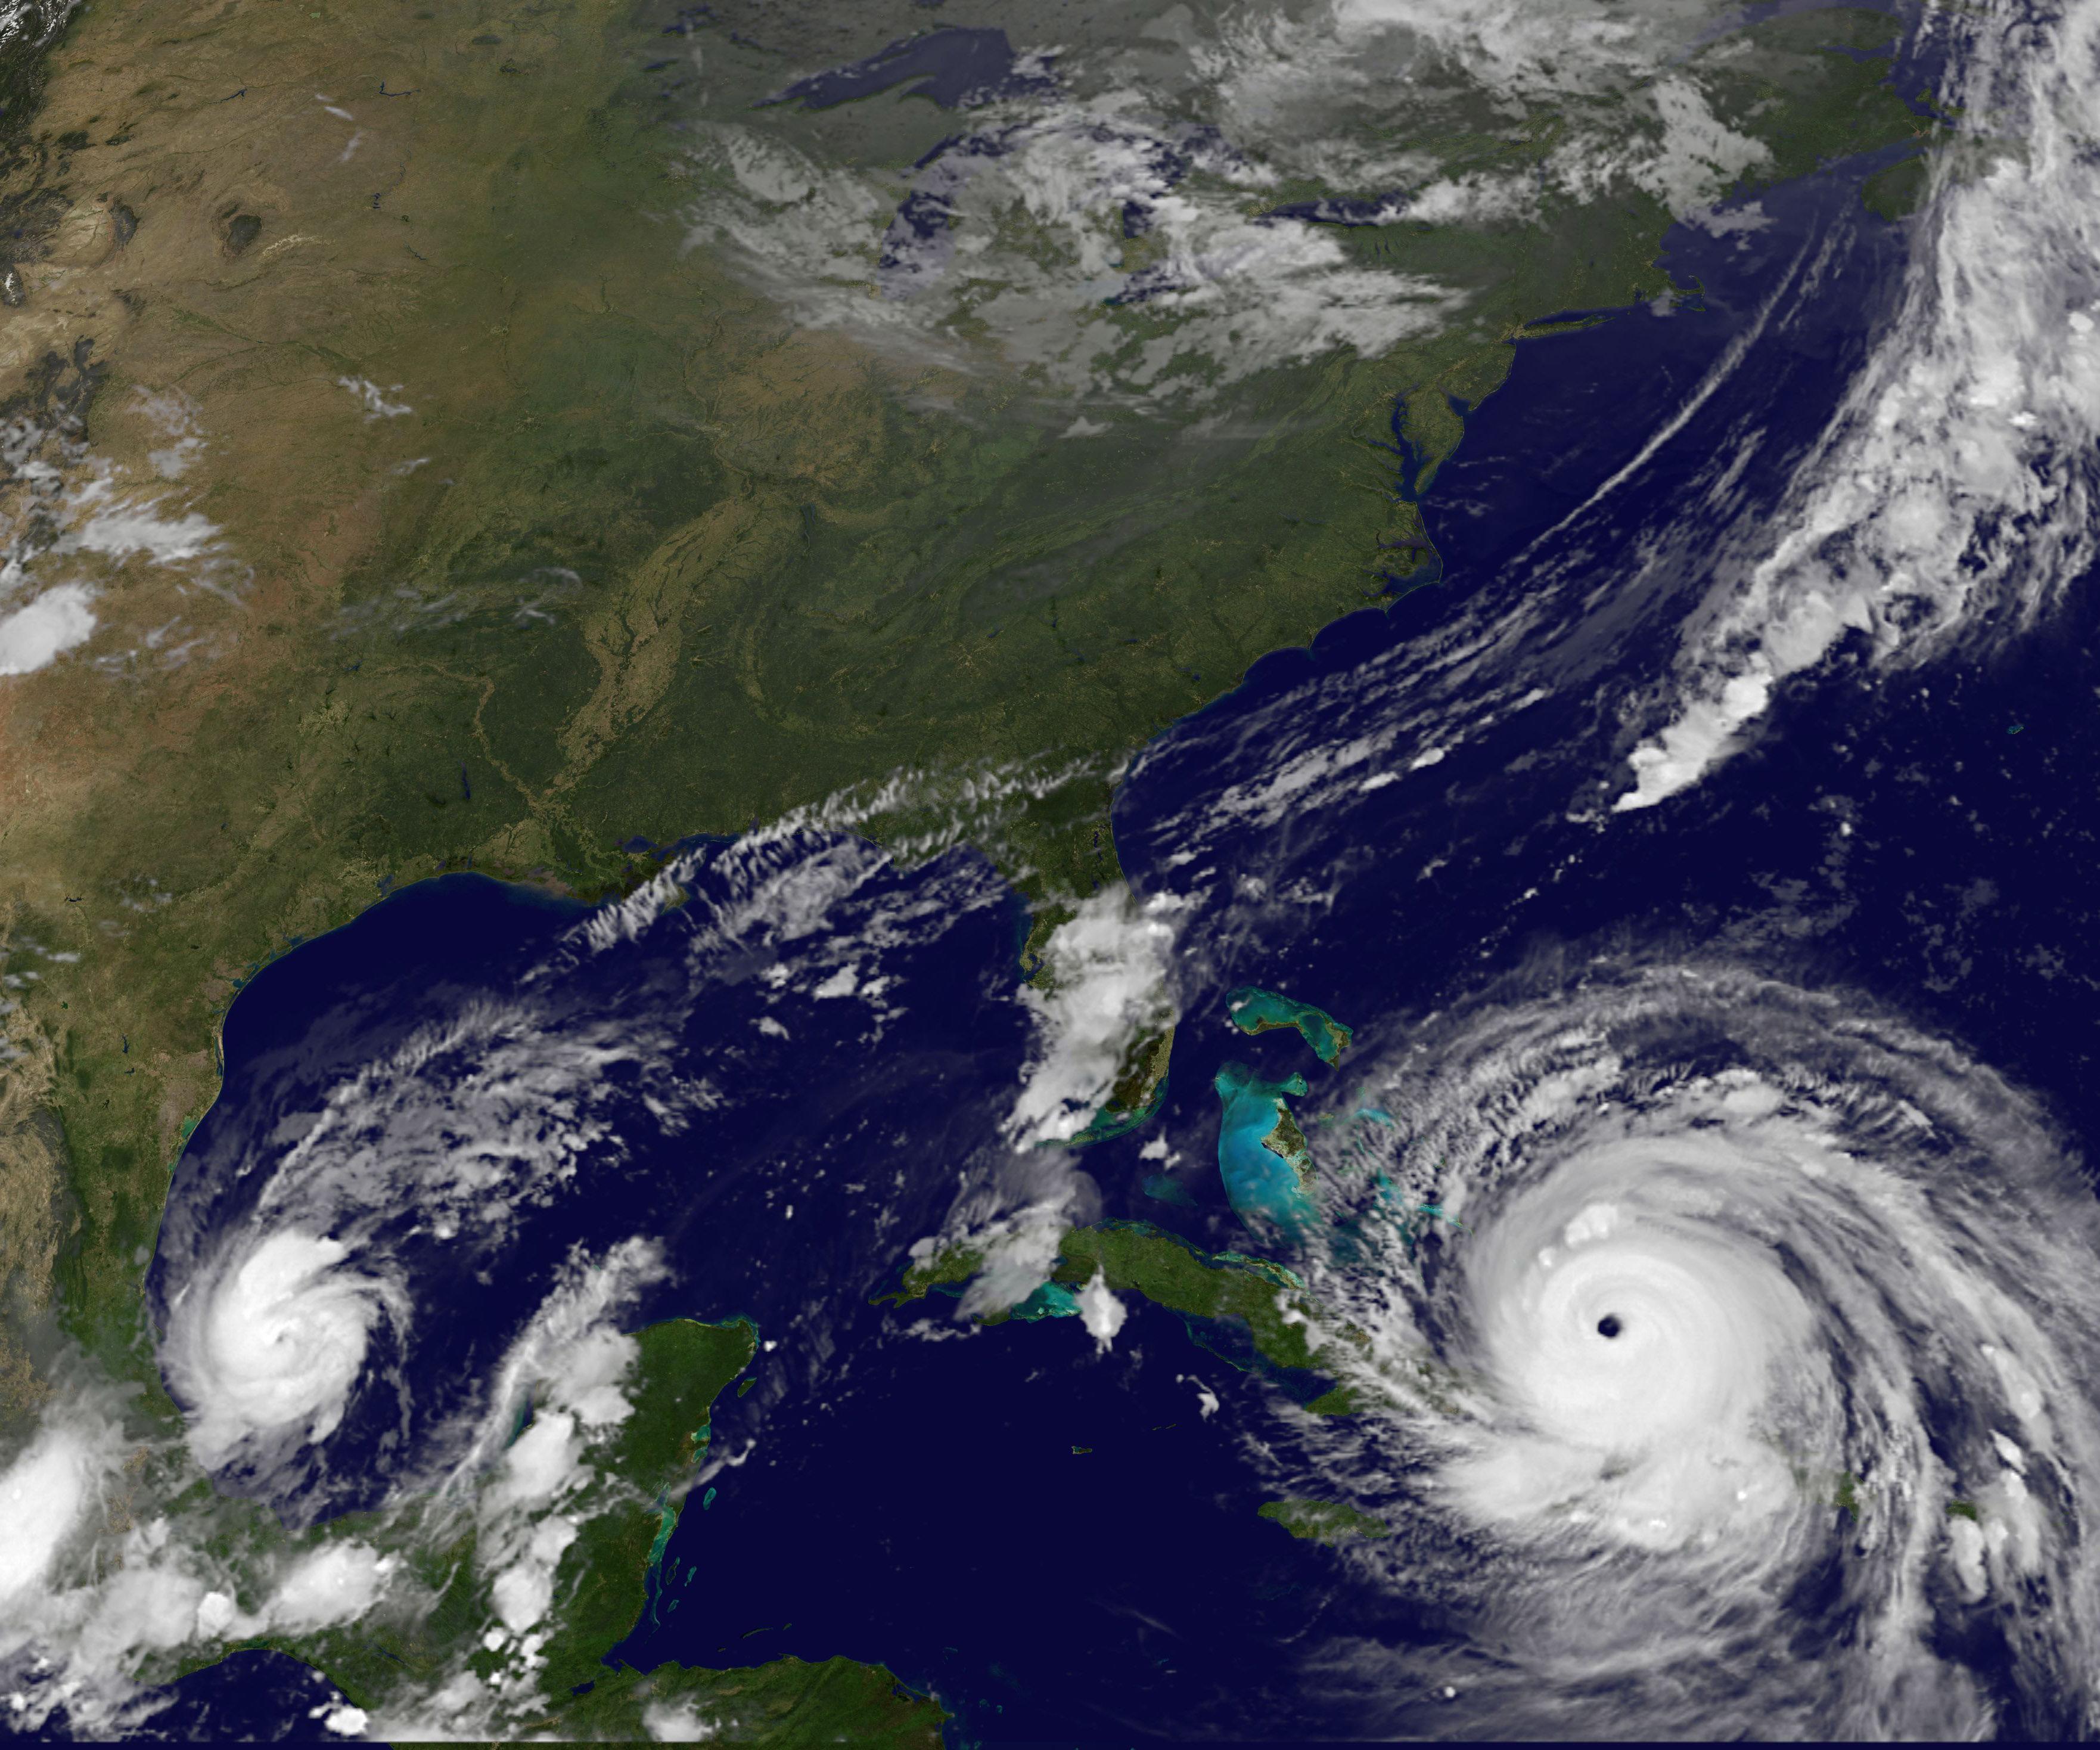 Satellite image of Hurricane Irma approaching the Florida